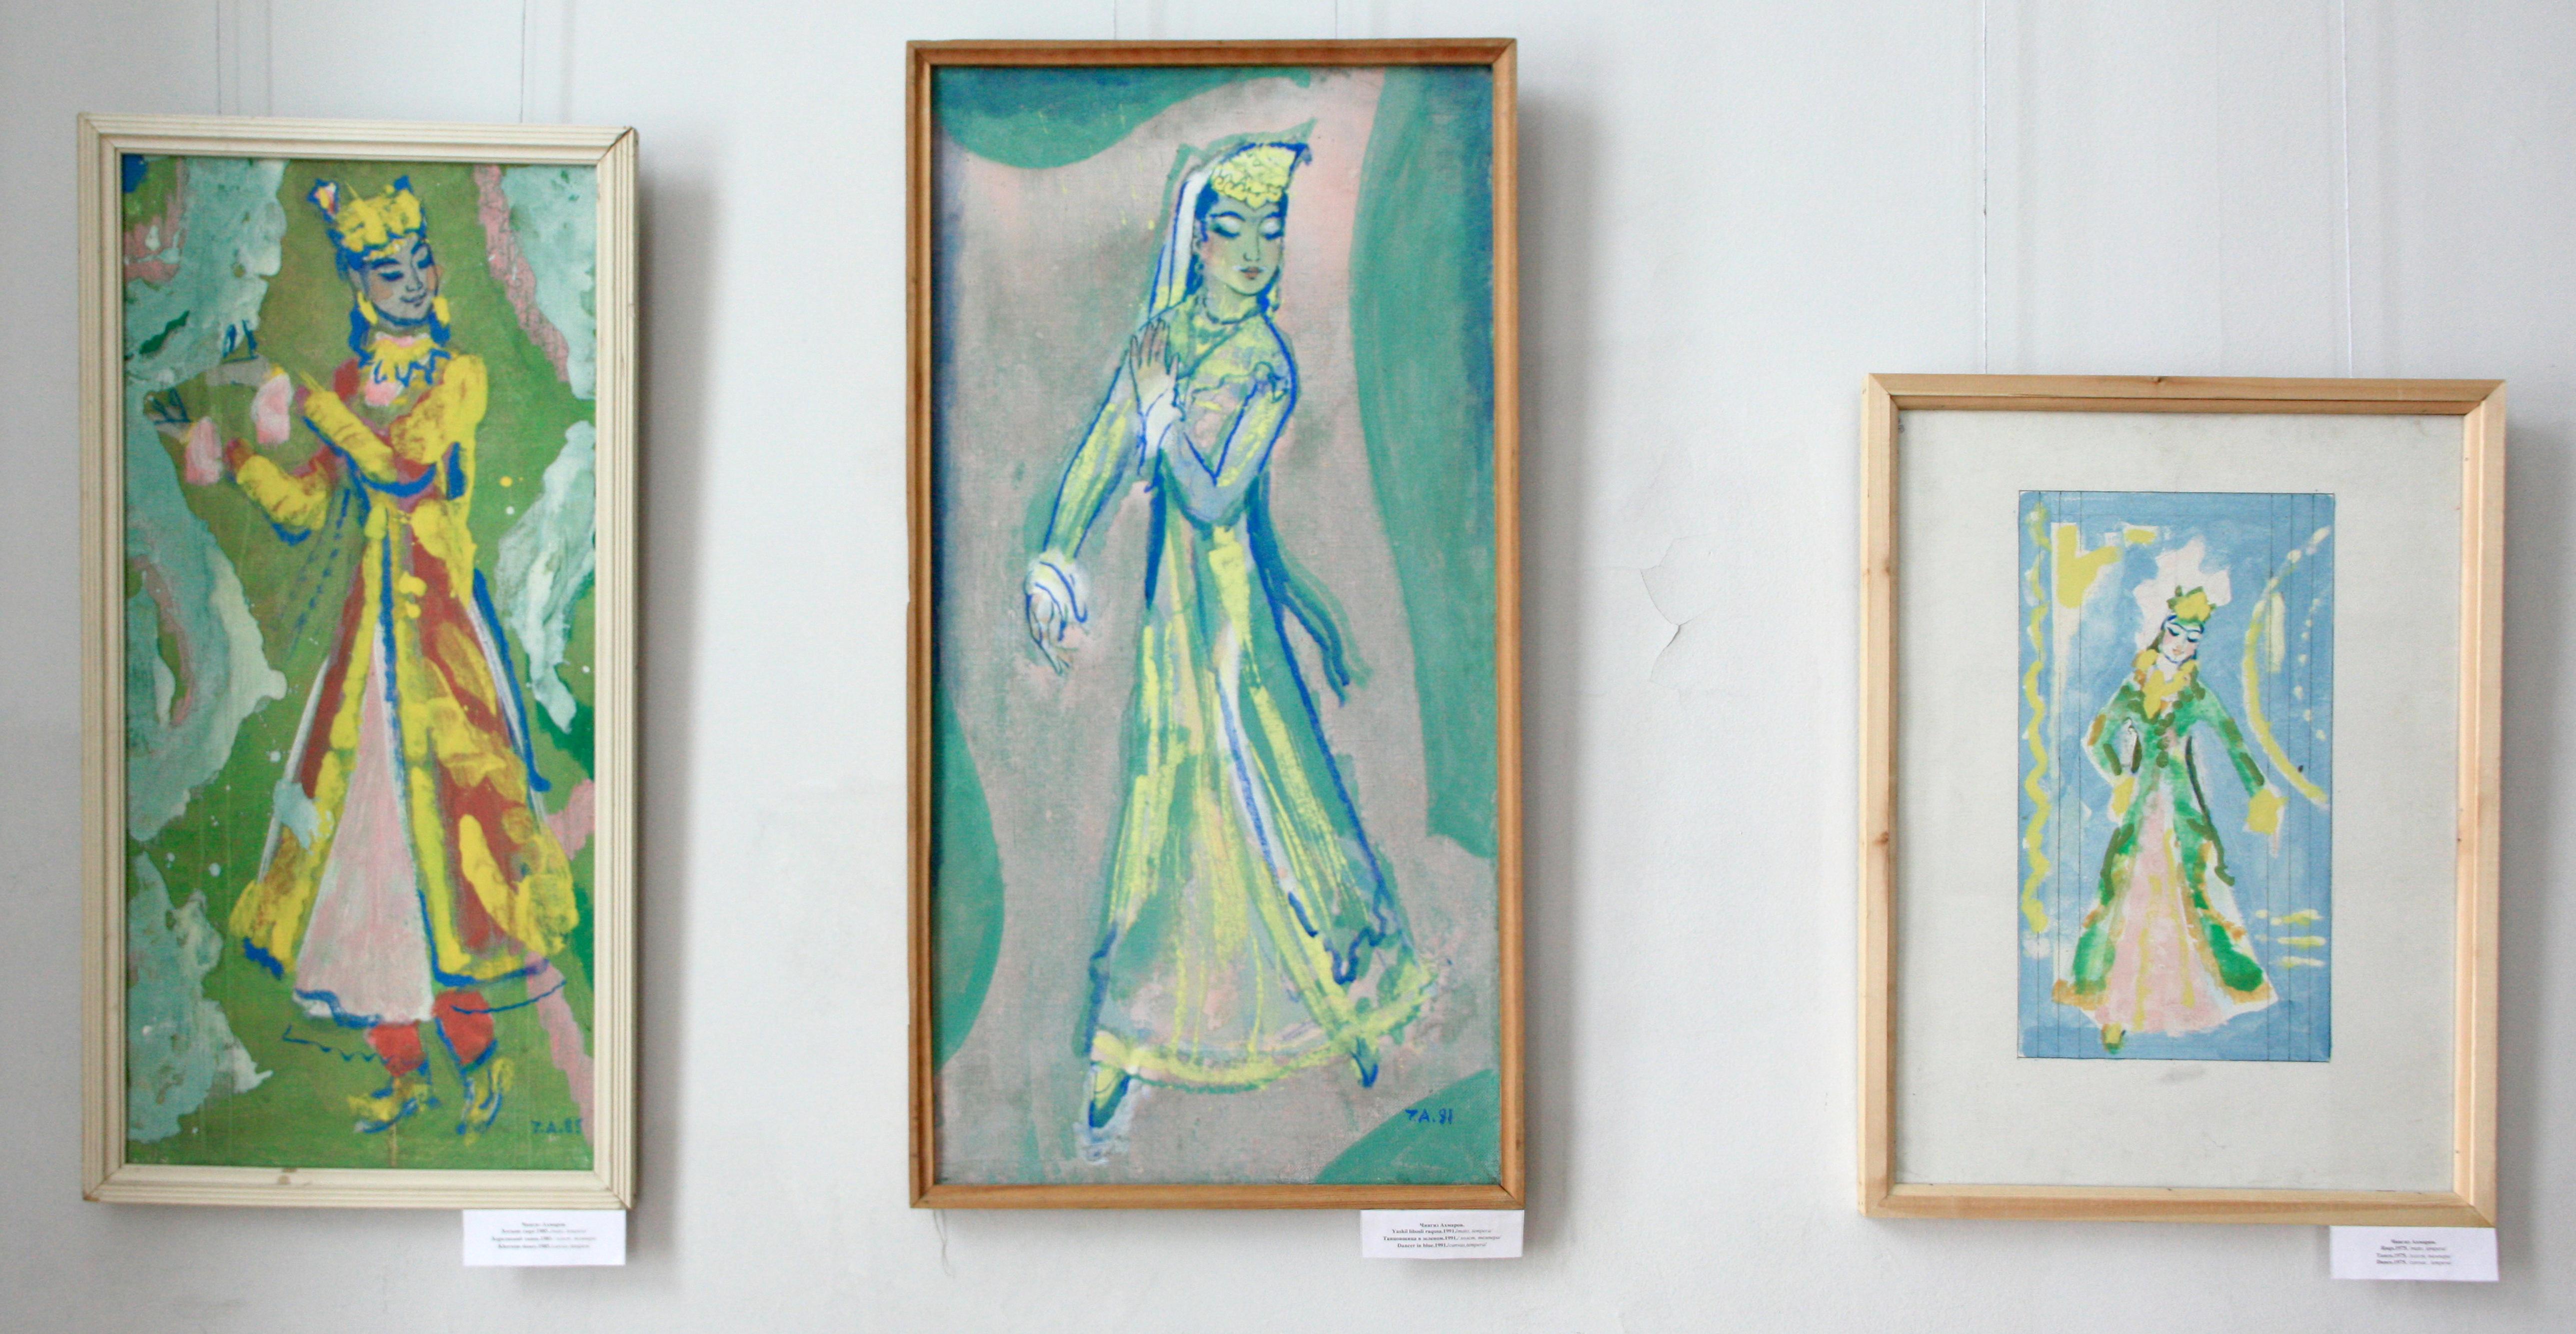 Ахмаров Чингиз. Хорезмский танец. 1985, Танцовщица в зелённом. 1991, Танец. 1975